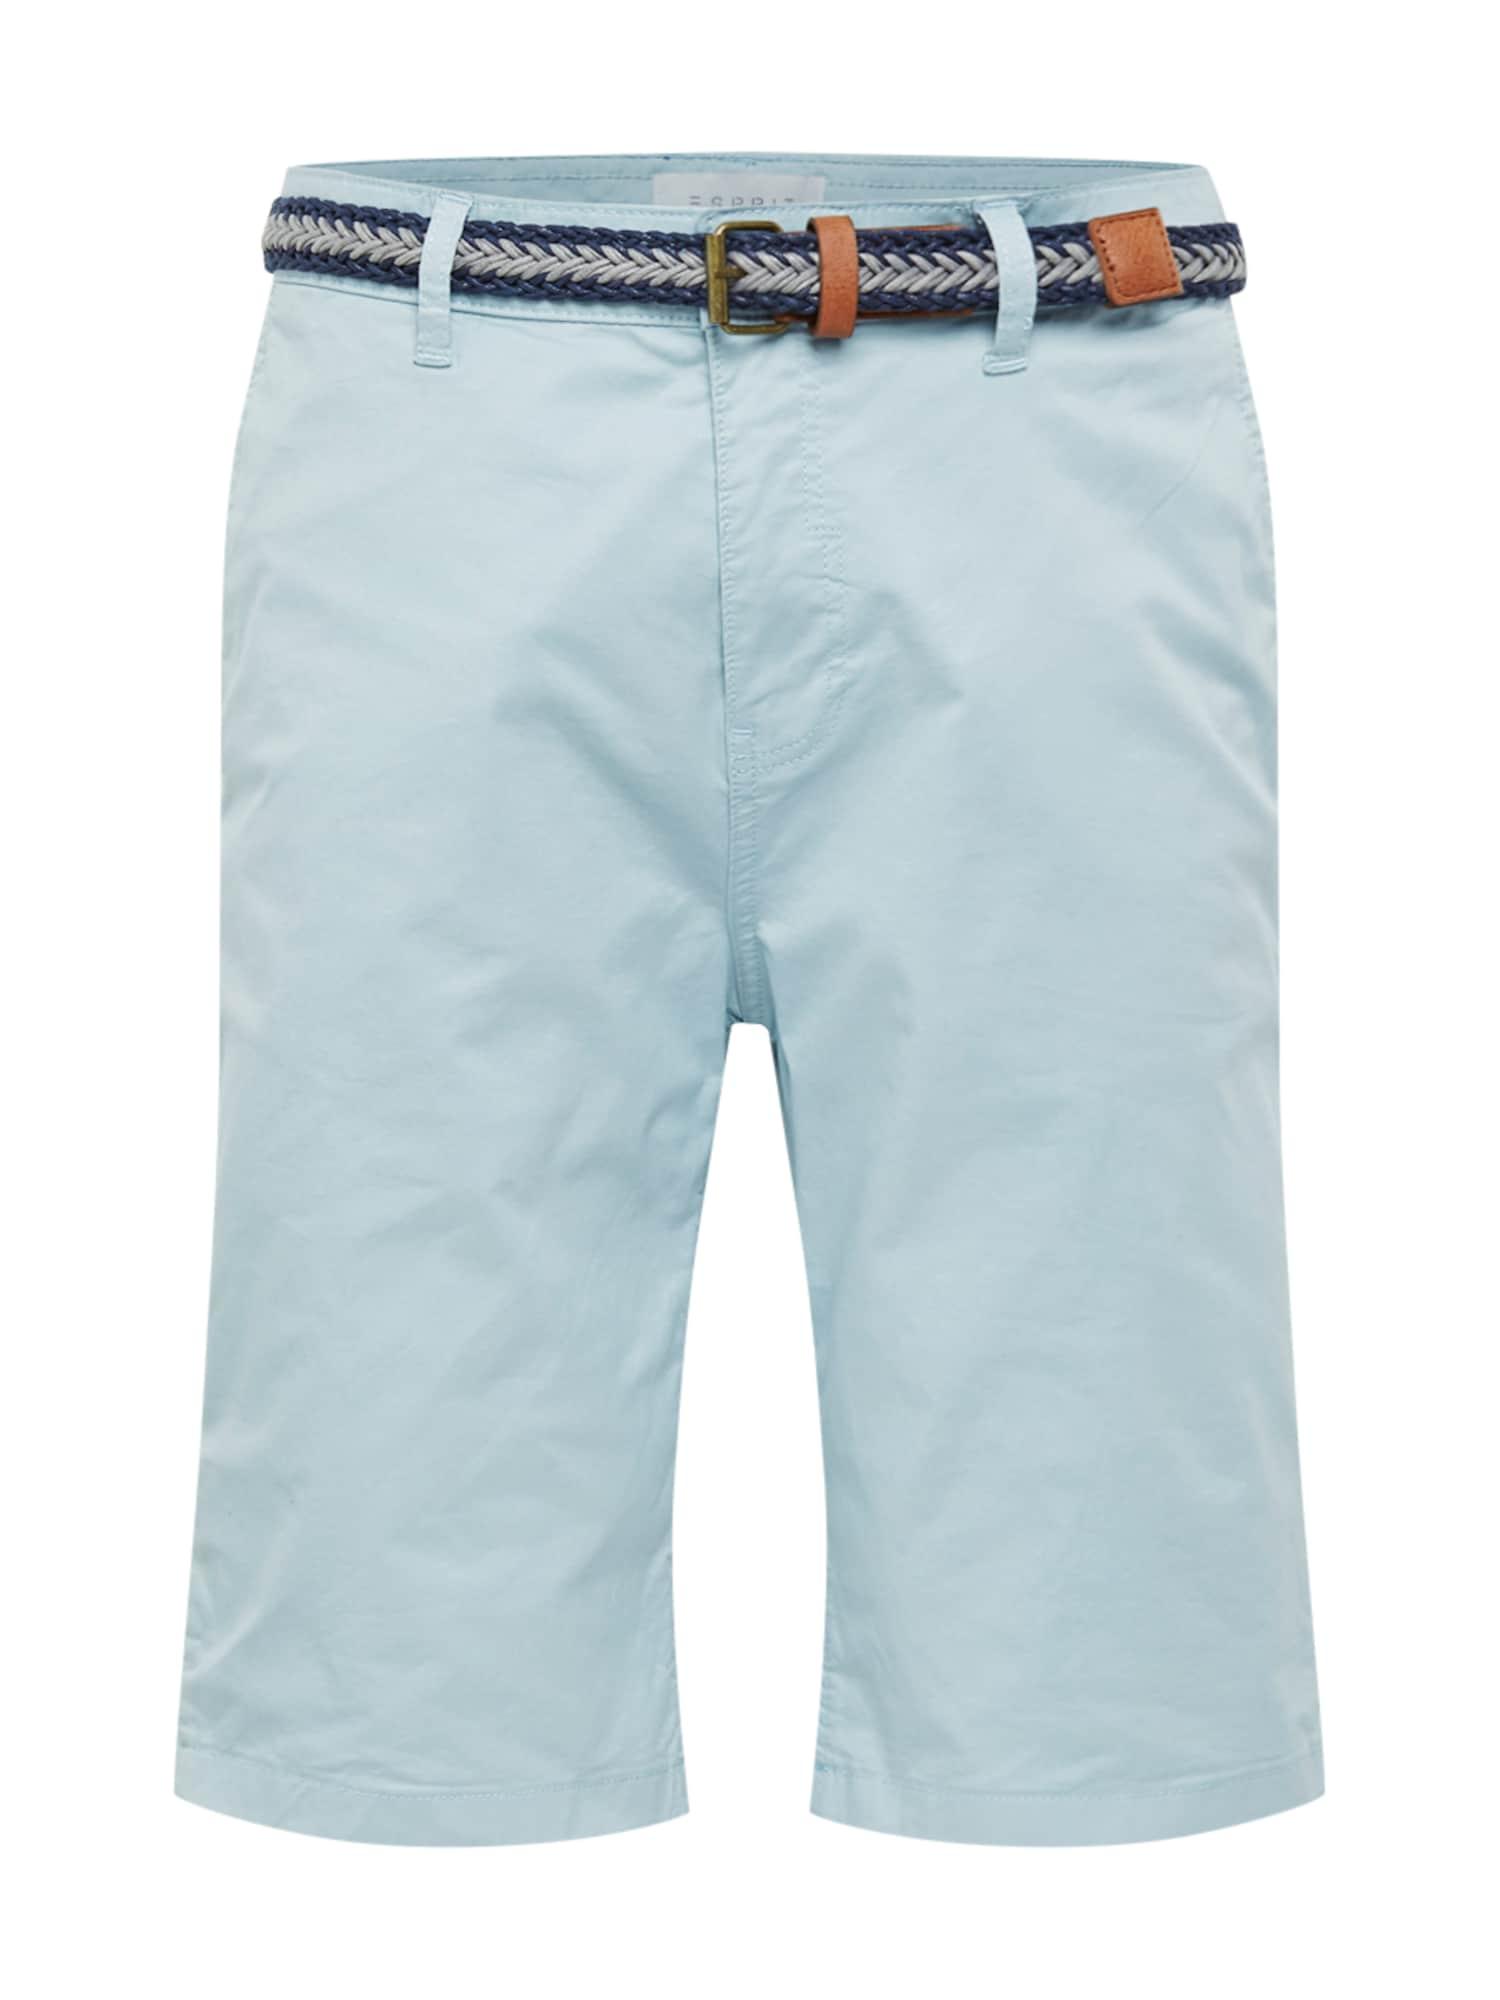 Chino kalhoty OCS shortx světlemodrá ESPRIT